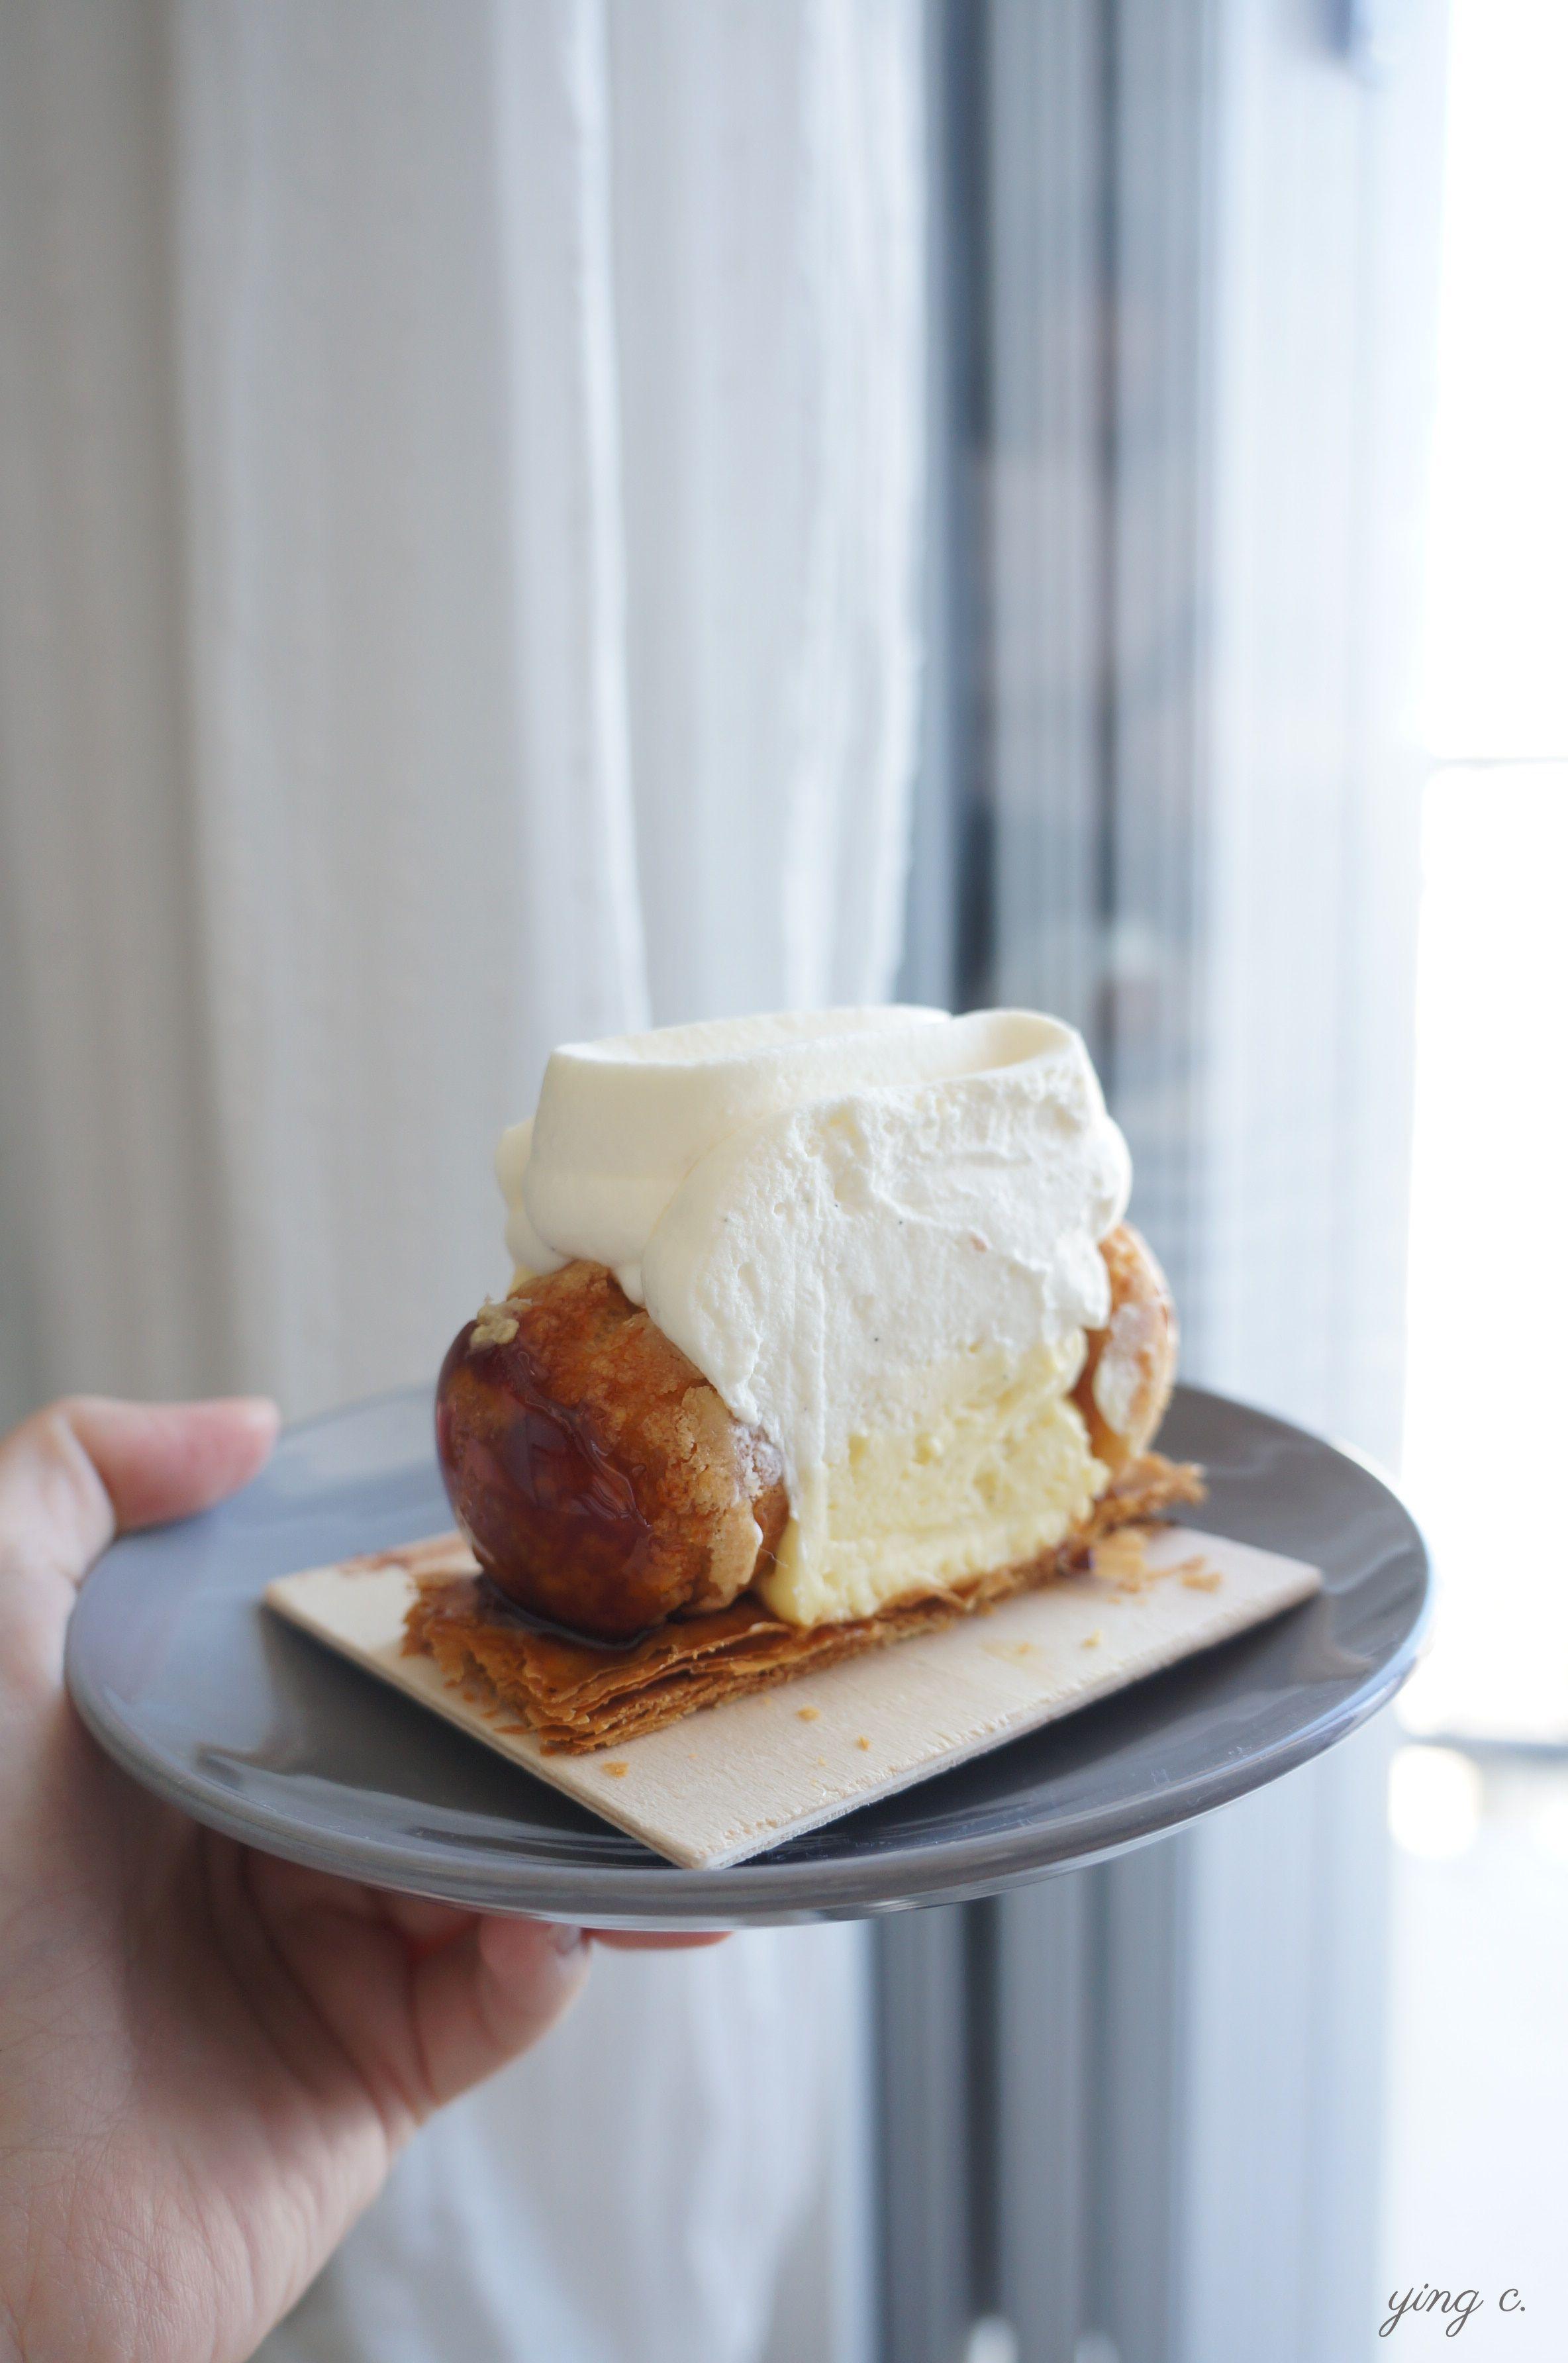 Jean-François Foucher主廚今年九月在Fou de Pâtisserie甜點店合作販售的Saint-Honoré聖多諾黑泡芙塔,是他的招牌作品。